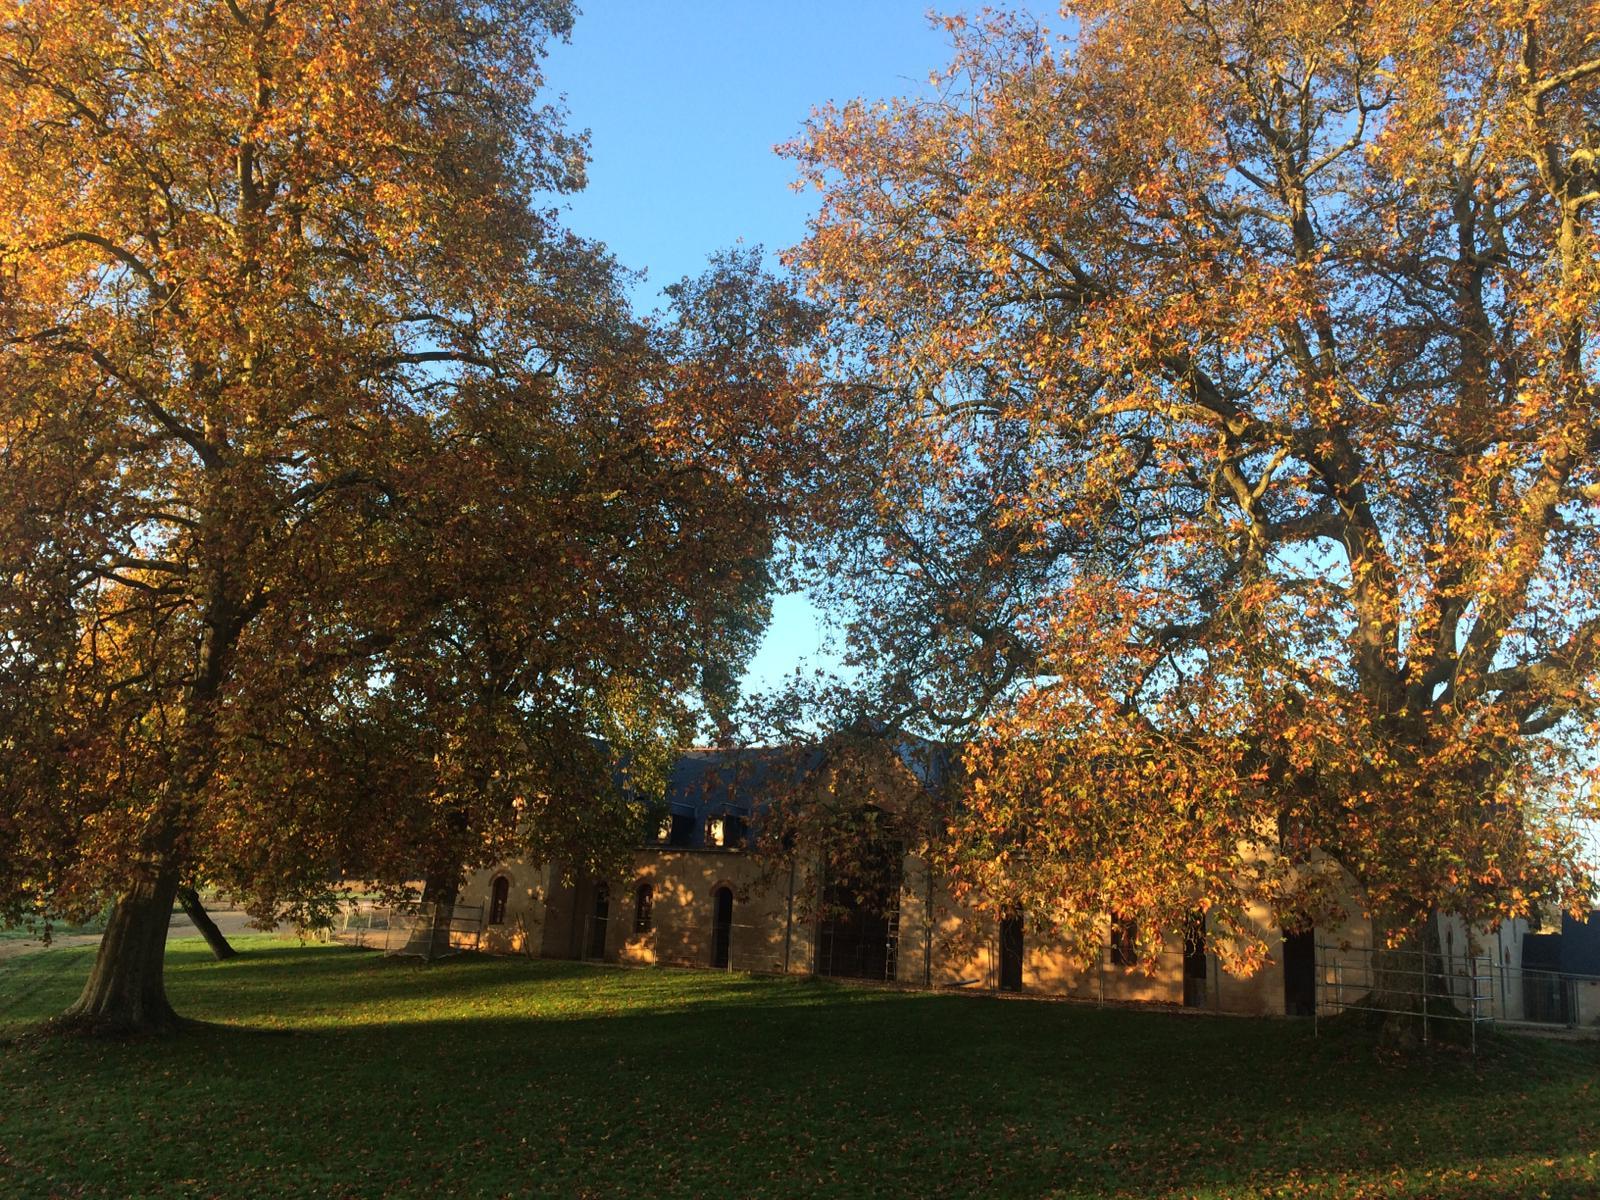 Bonnevaux October.November Update